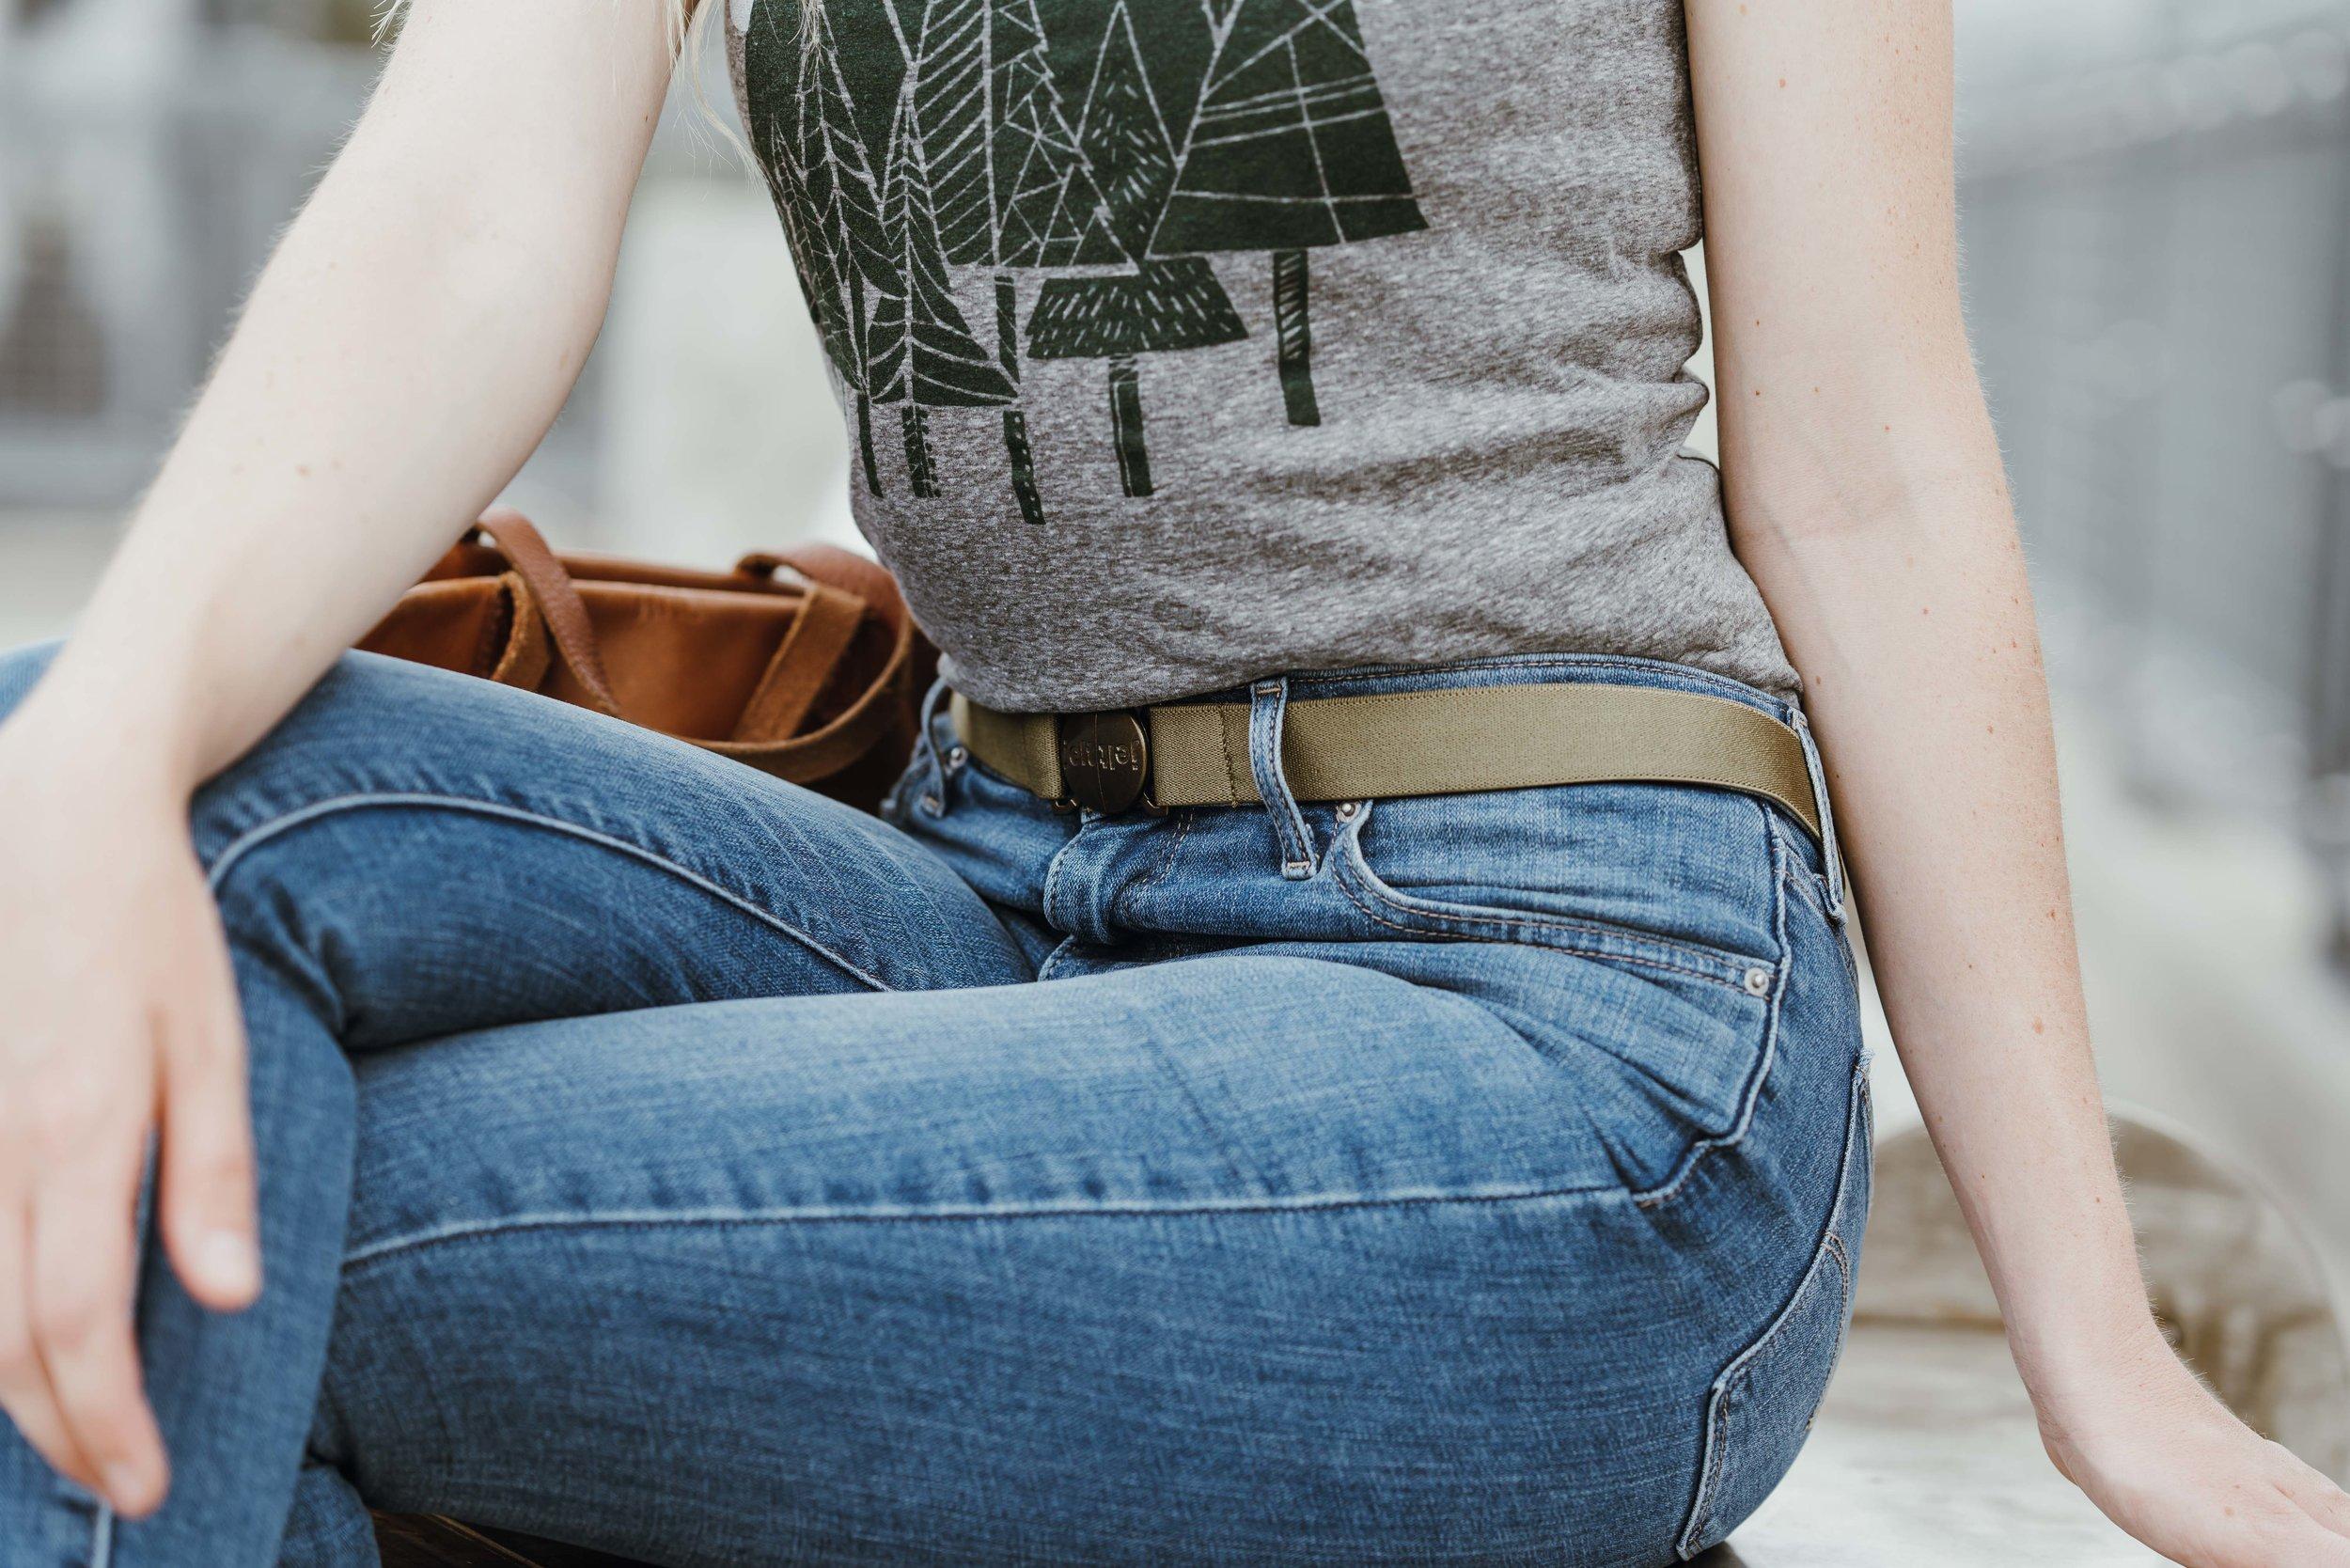 denver photographer commercial lifestyle shoot with Jelt Belt outdoor brand - DSD08767.jpg